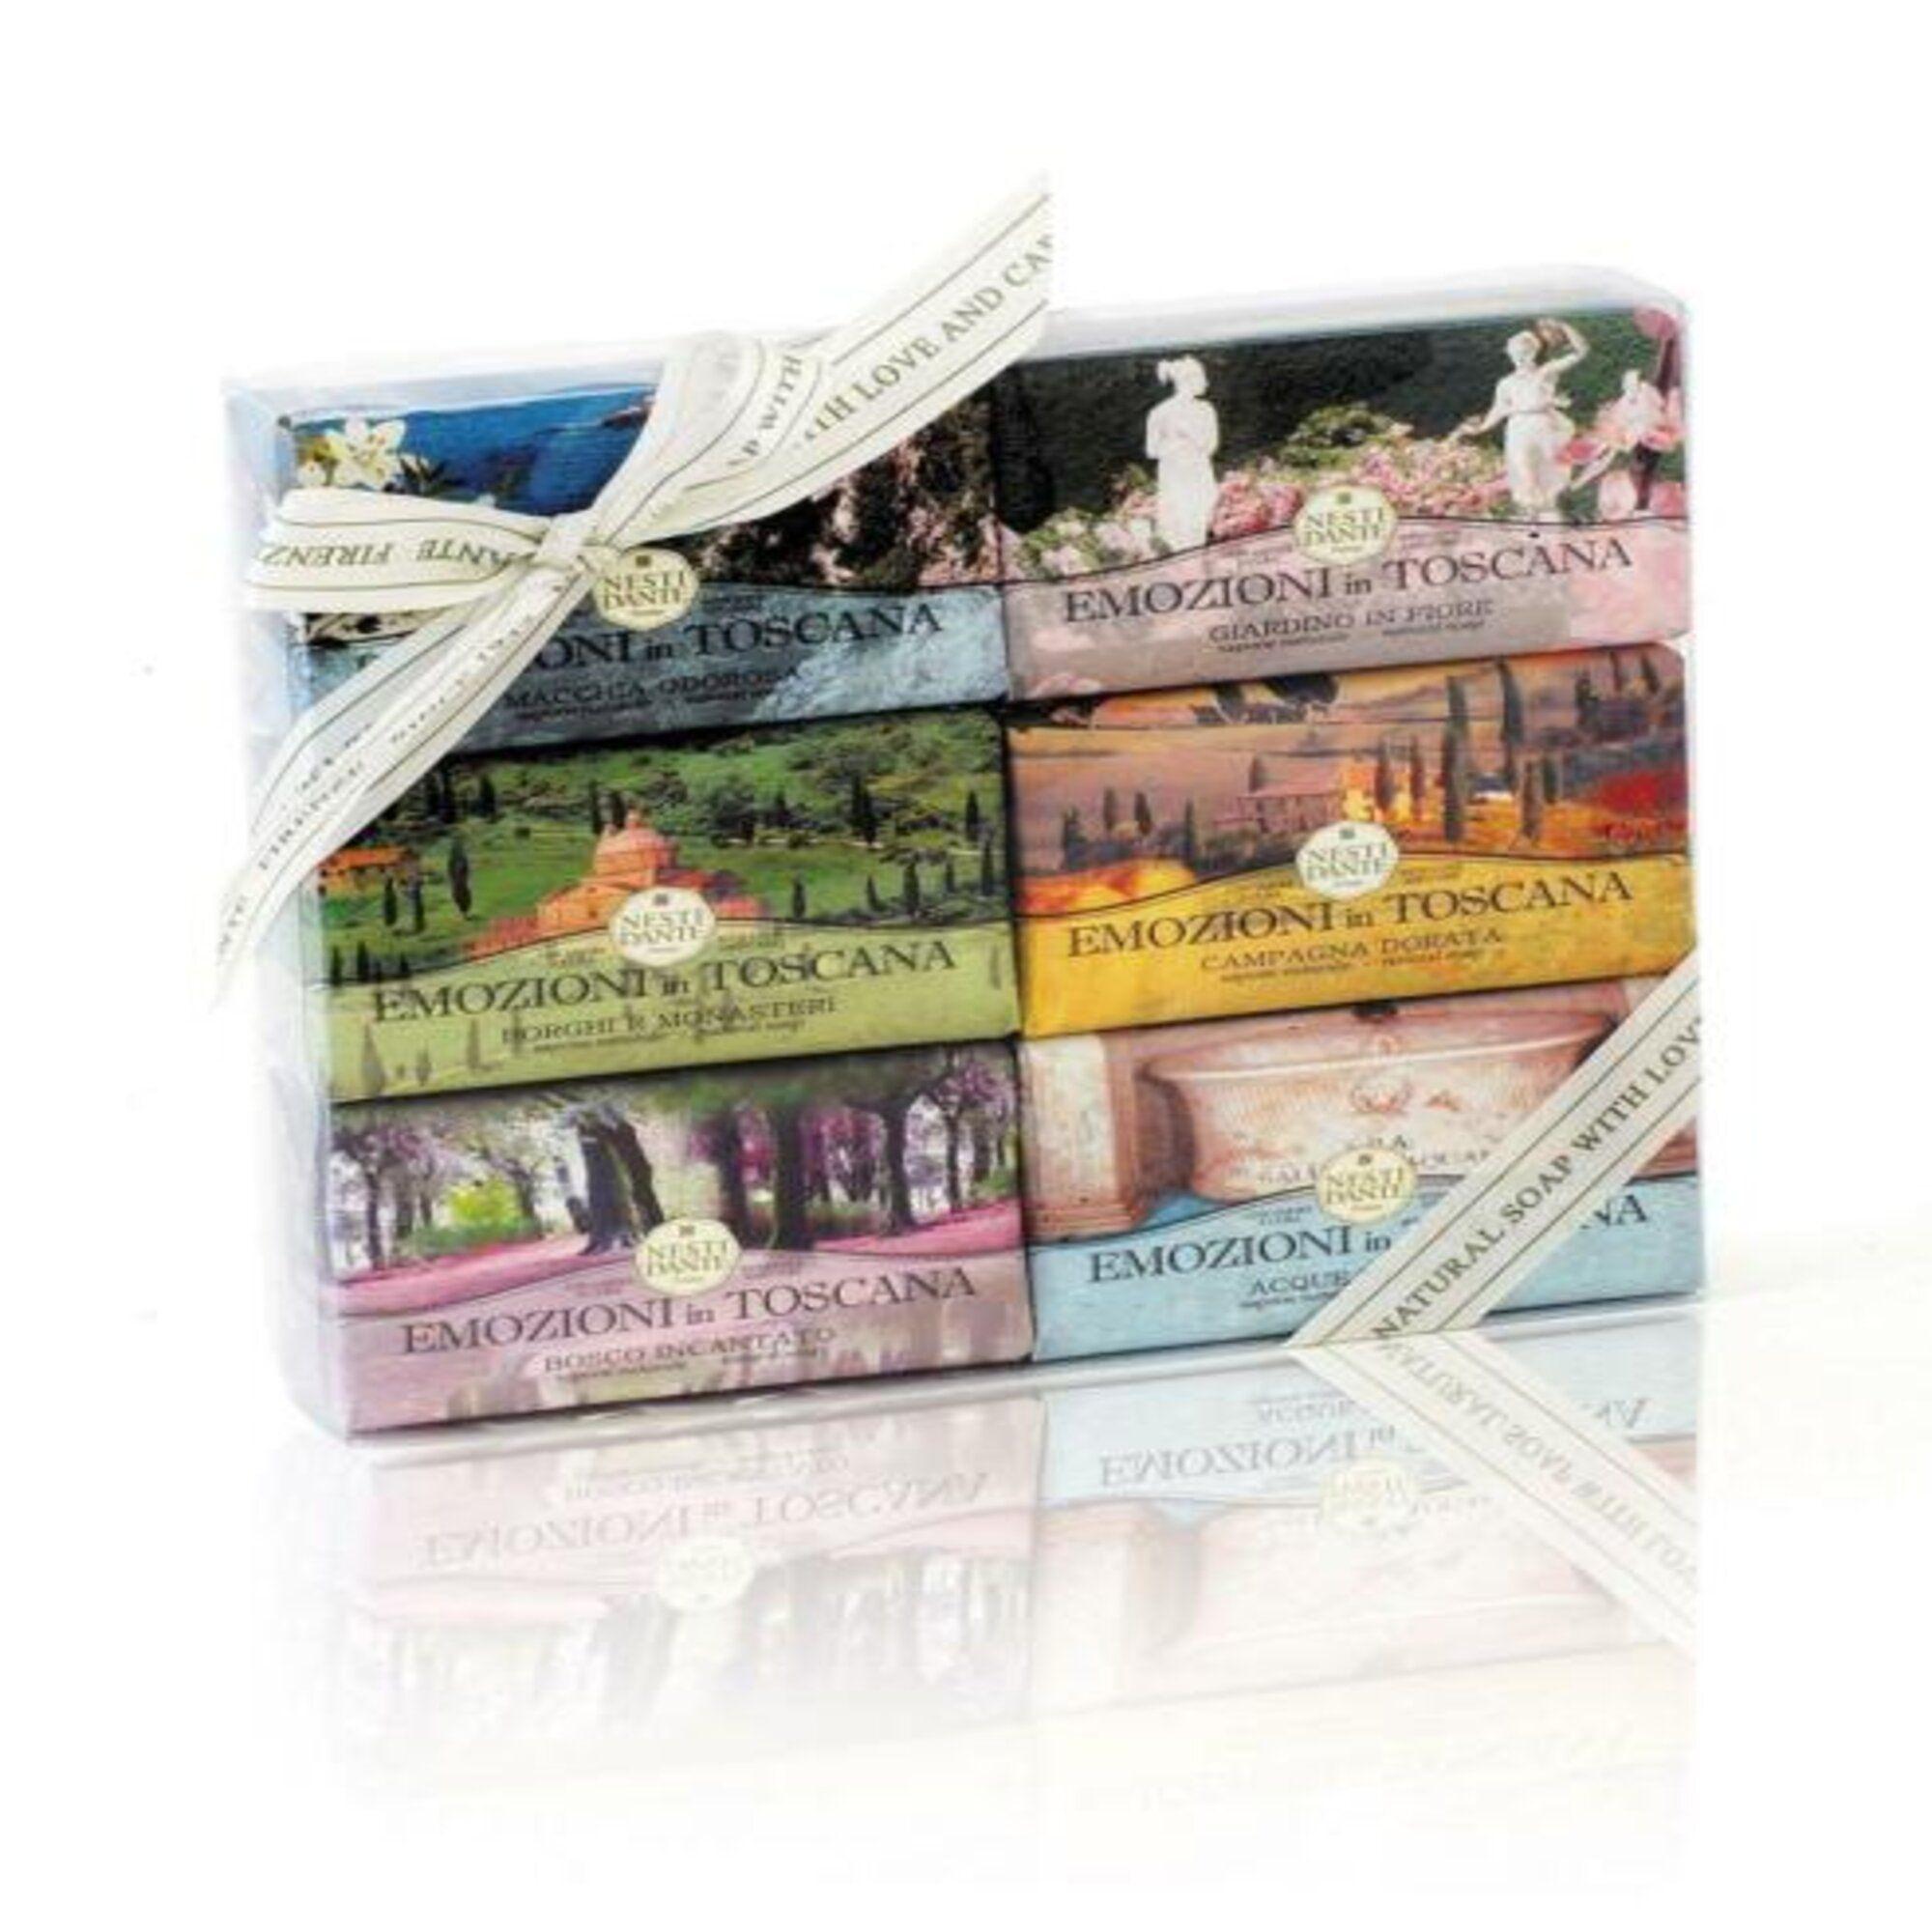 Sabonete Kit Collection Emozioni In Toscana 6 x 150gr Nesti Dante